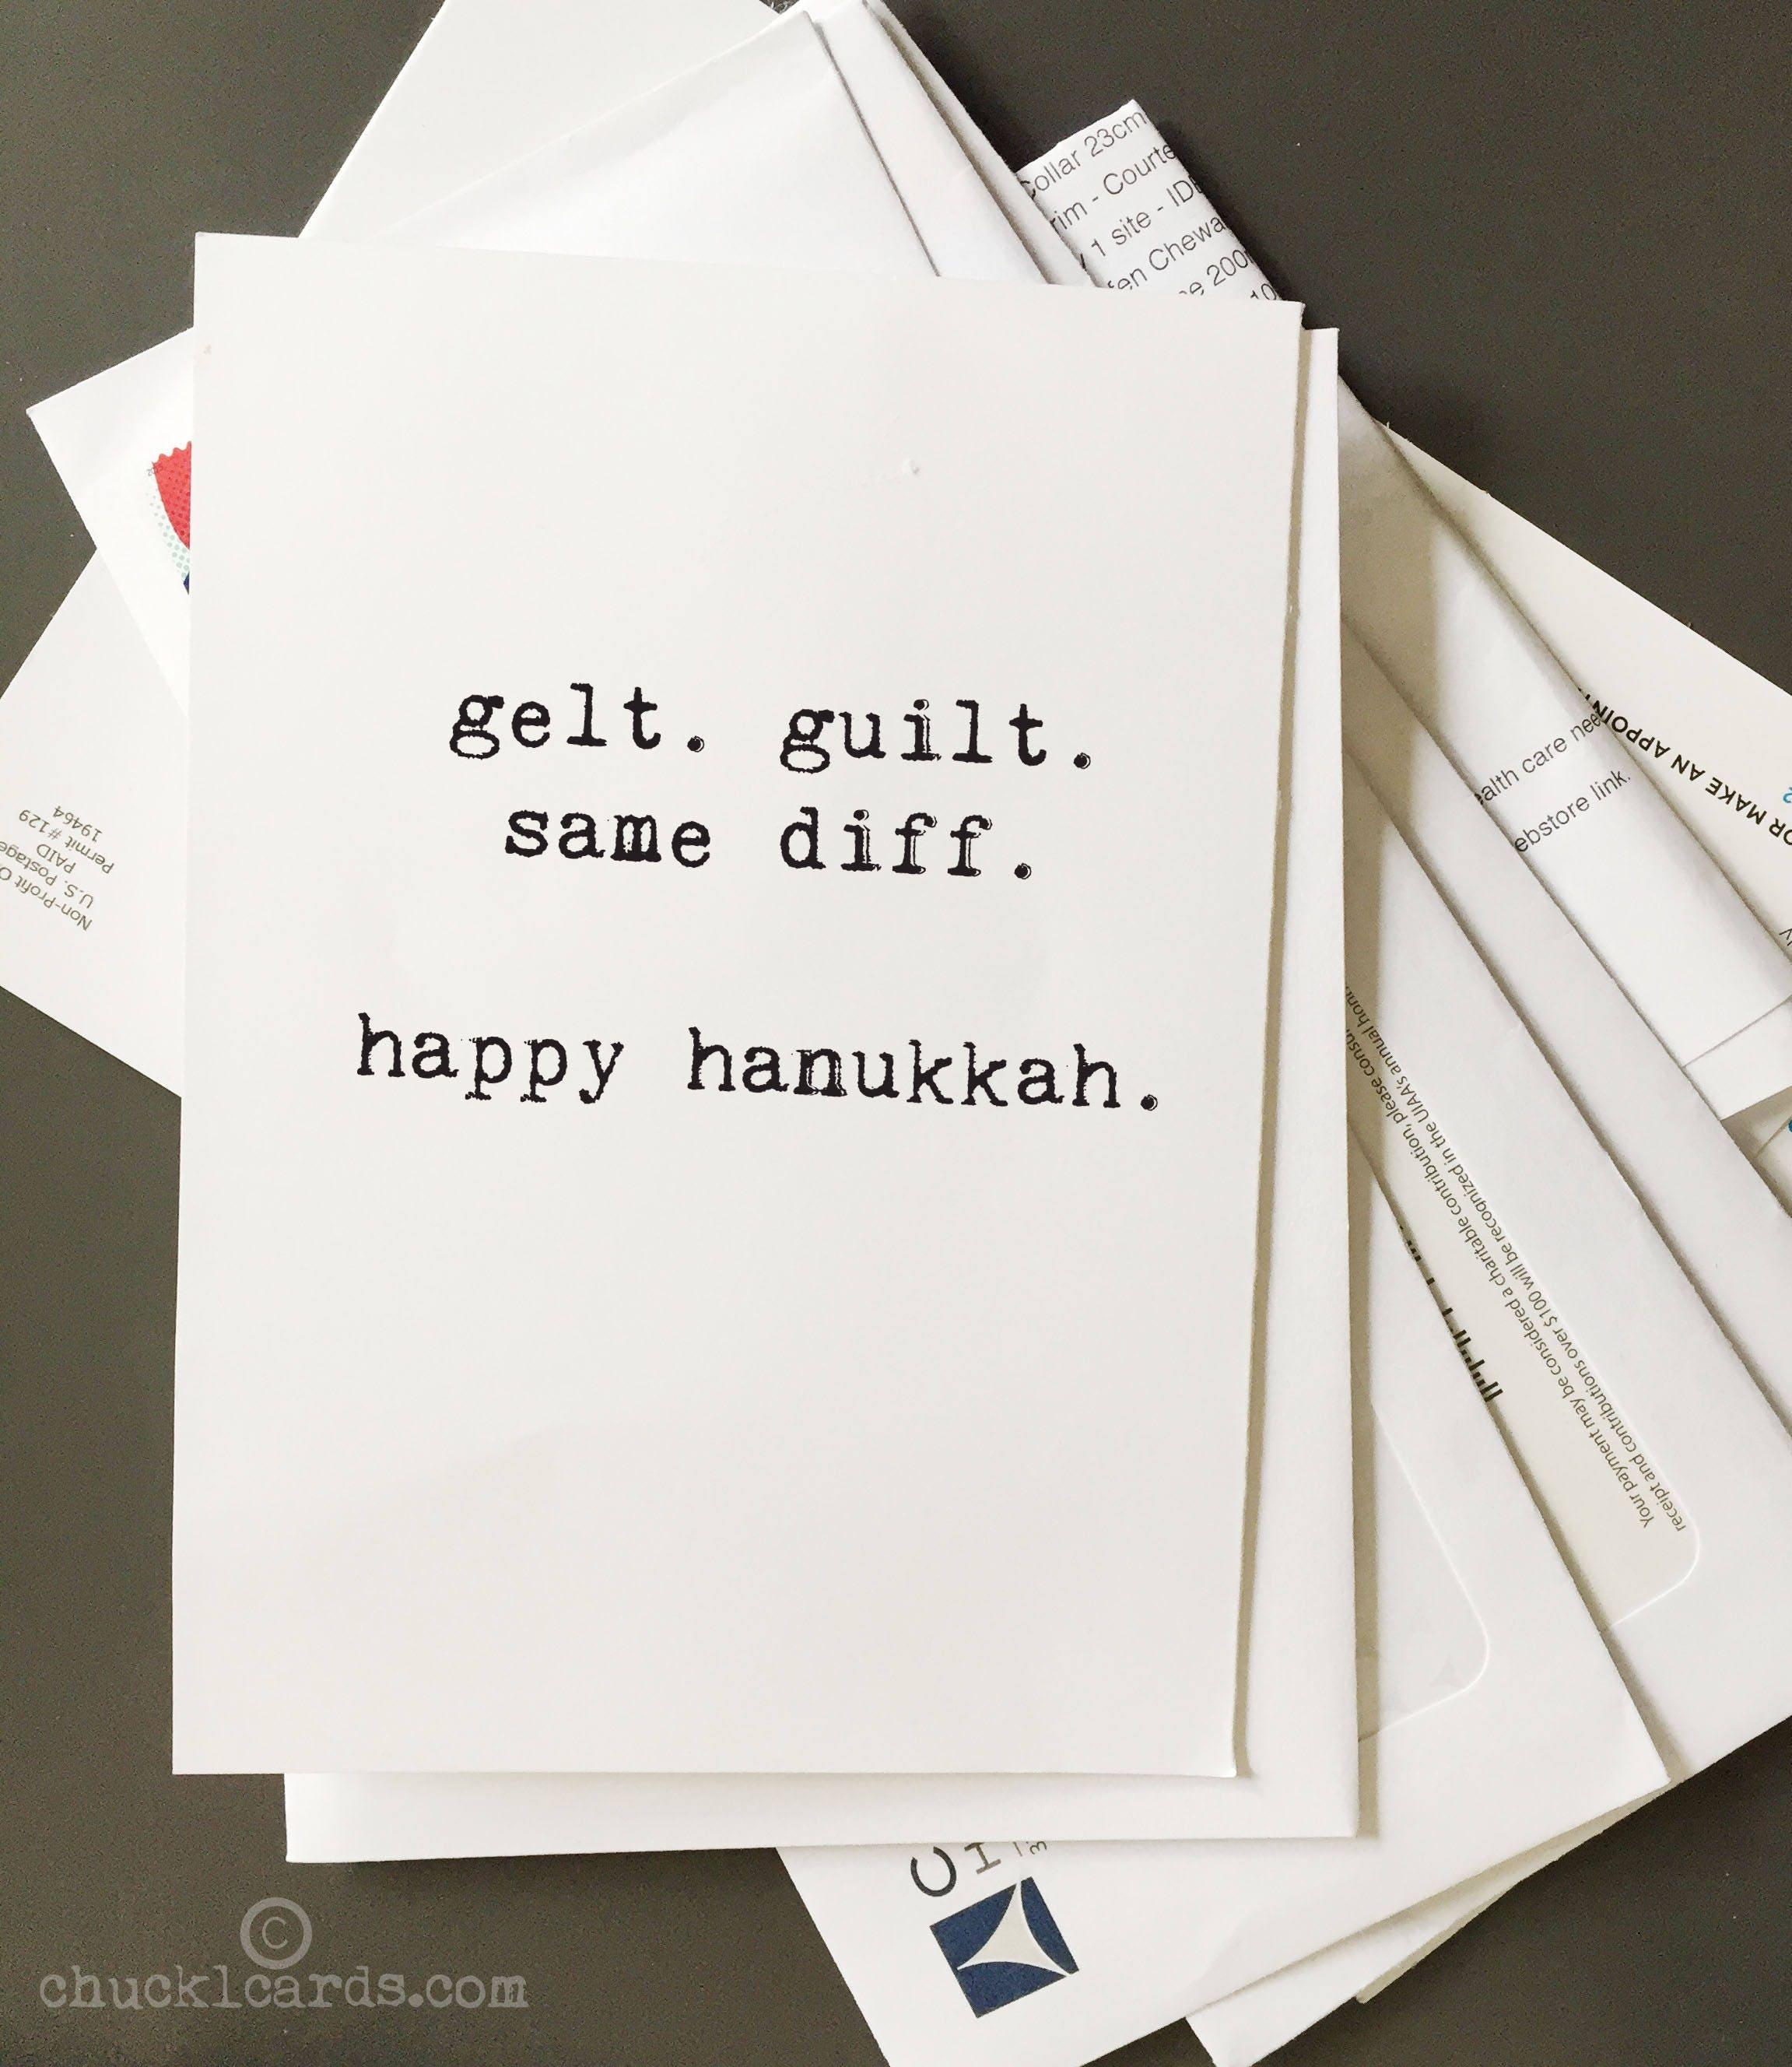 hanukkah card geltguilt card holiday cards jewish humor funny hanukkah card chanukah card blank inside typewriter font chucklcards - Funny Hanukkah Cards